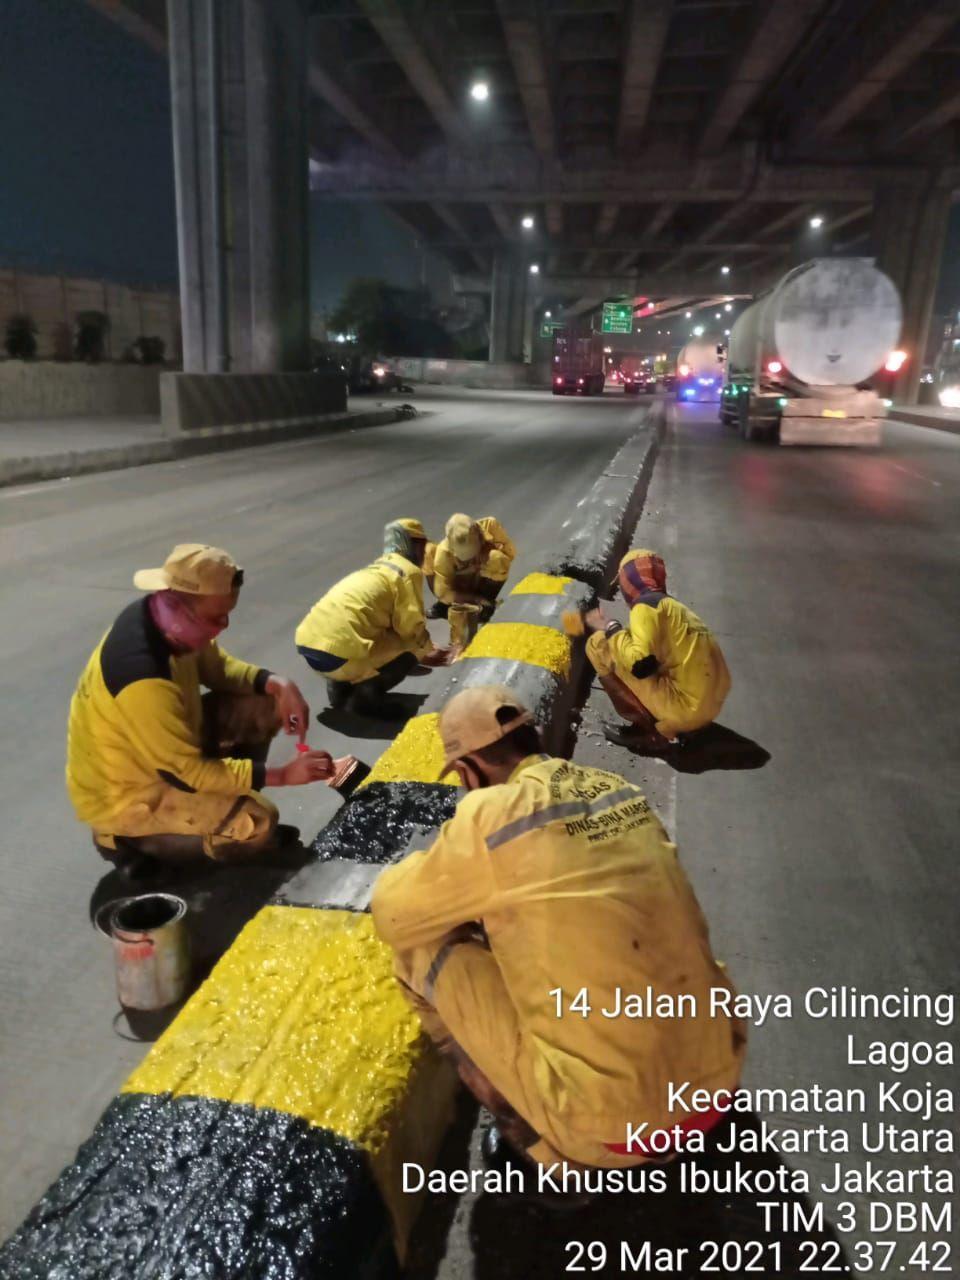 Dinas Bina Marga DKI kembali mengecat pembatas Jl Raya Cilincing yang berbahaya. (Dok Dinas Bina Marga DKI Jakarta)